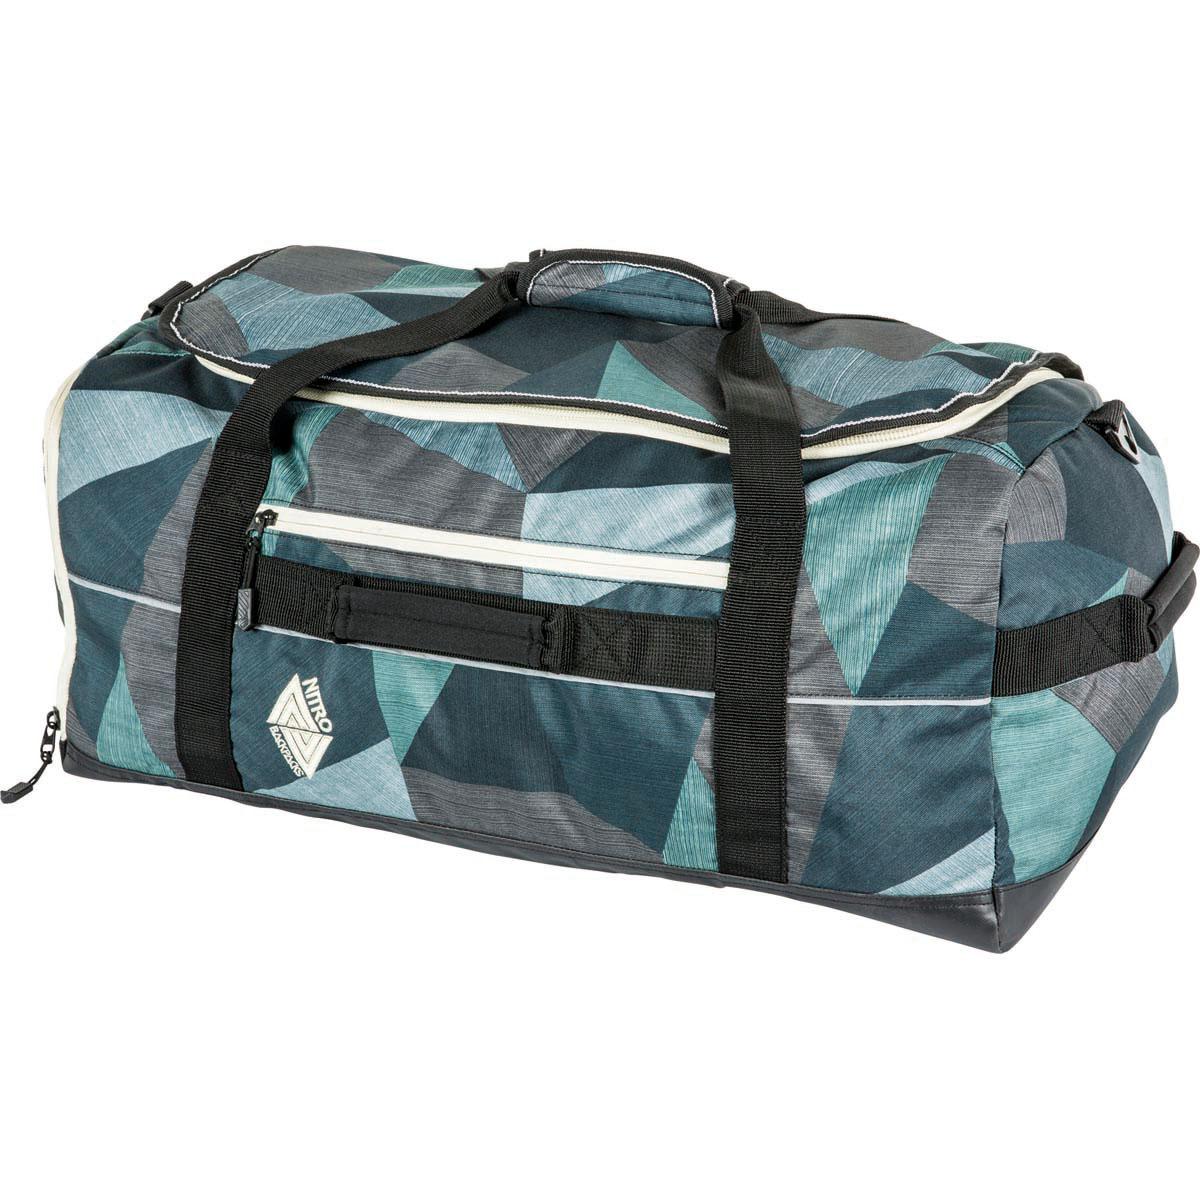 Wheelie bags for school - Nitro Team Duffle Sporttasche Fragments Green 53 L Nitrobags Shop